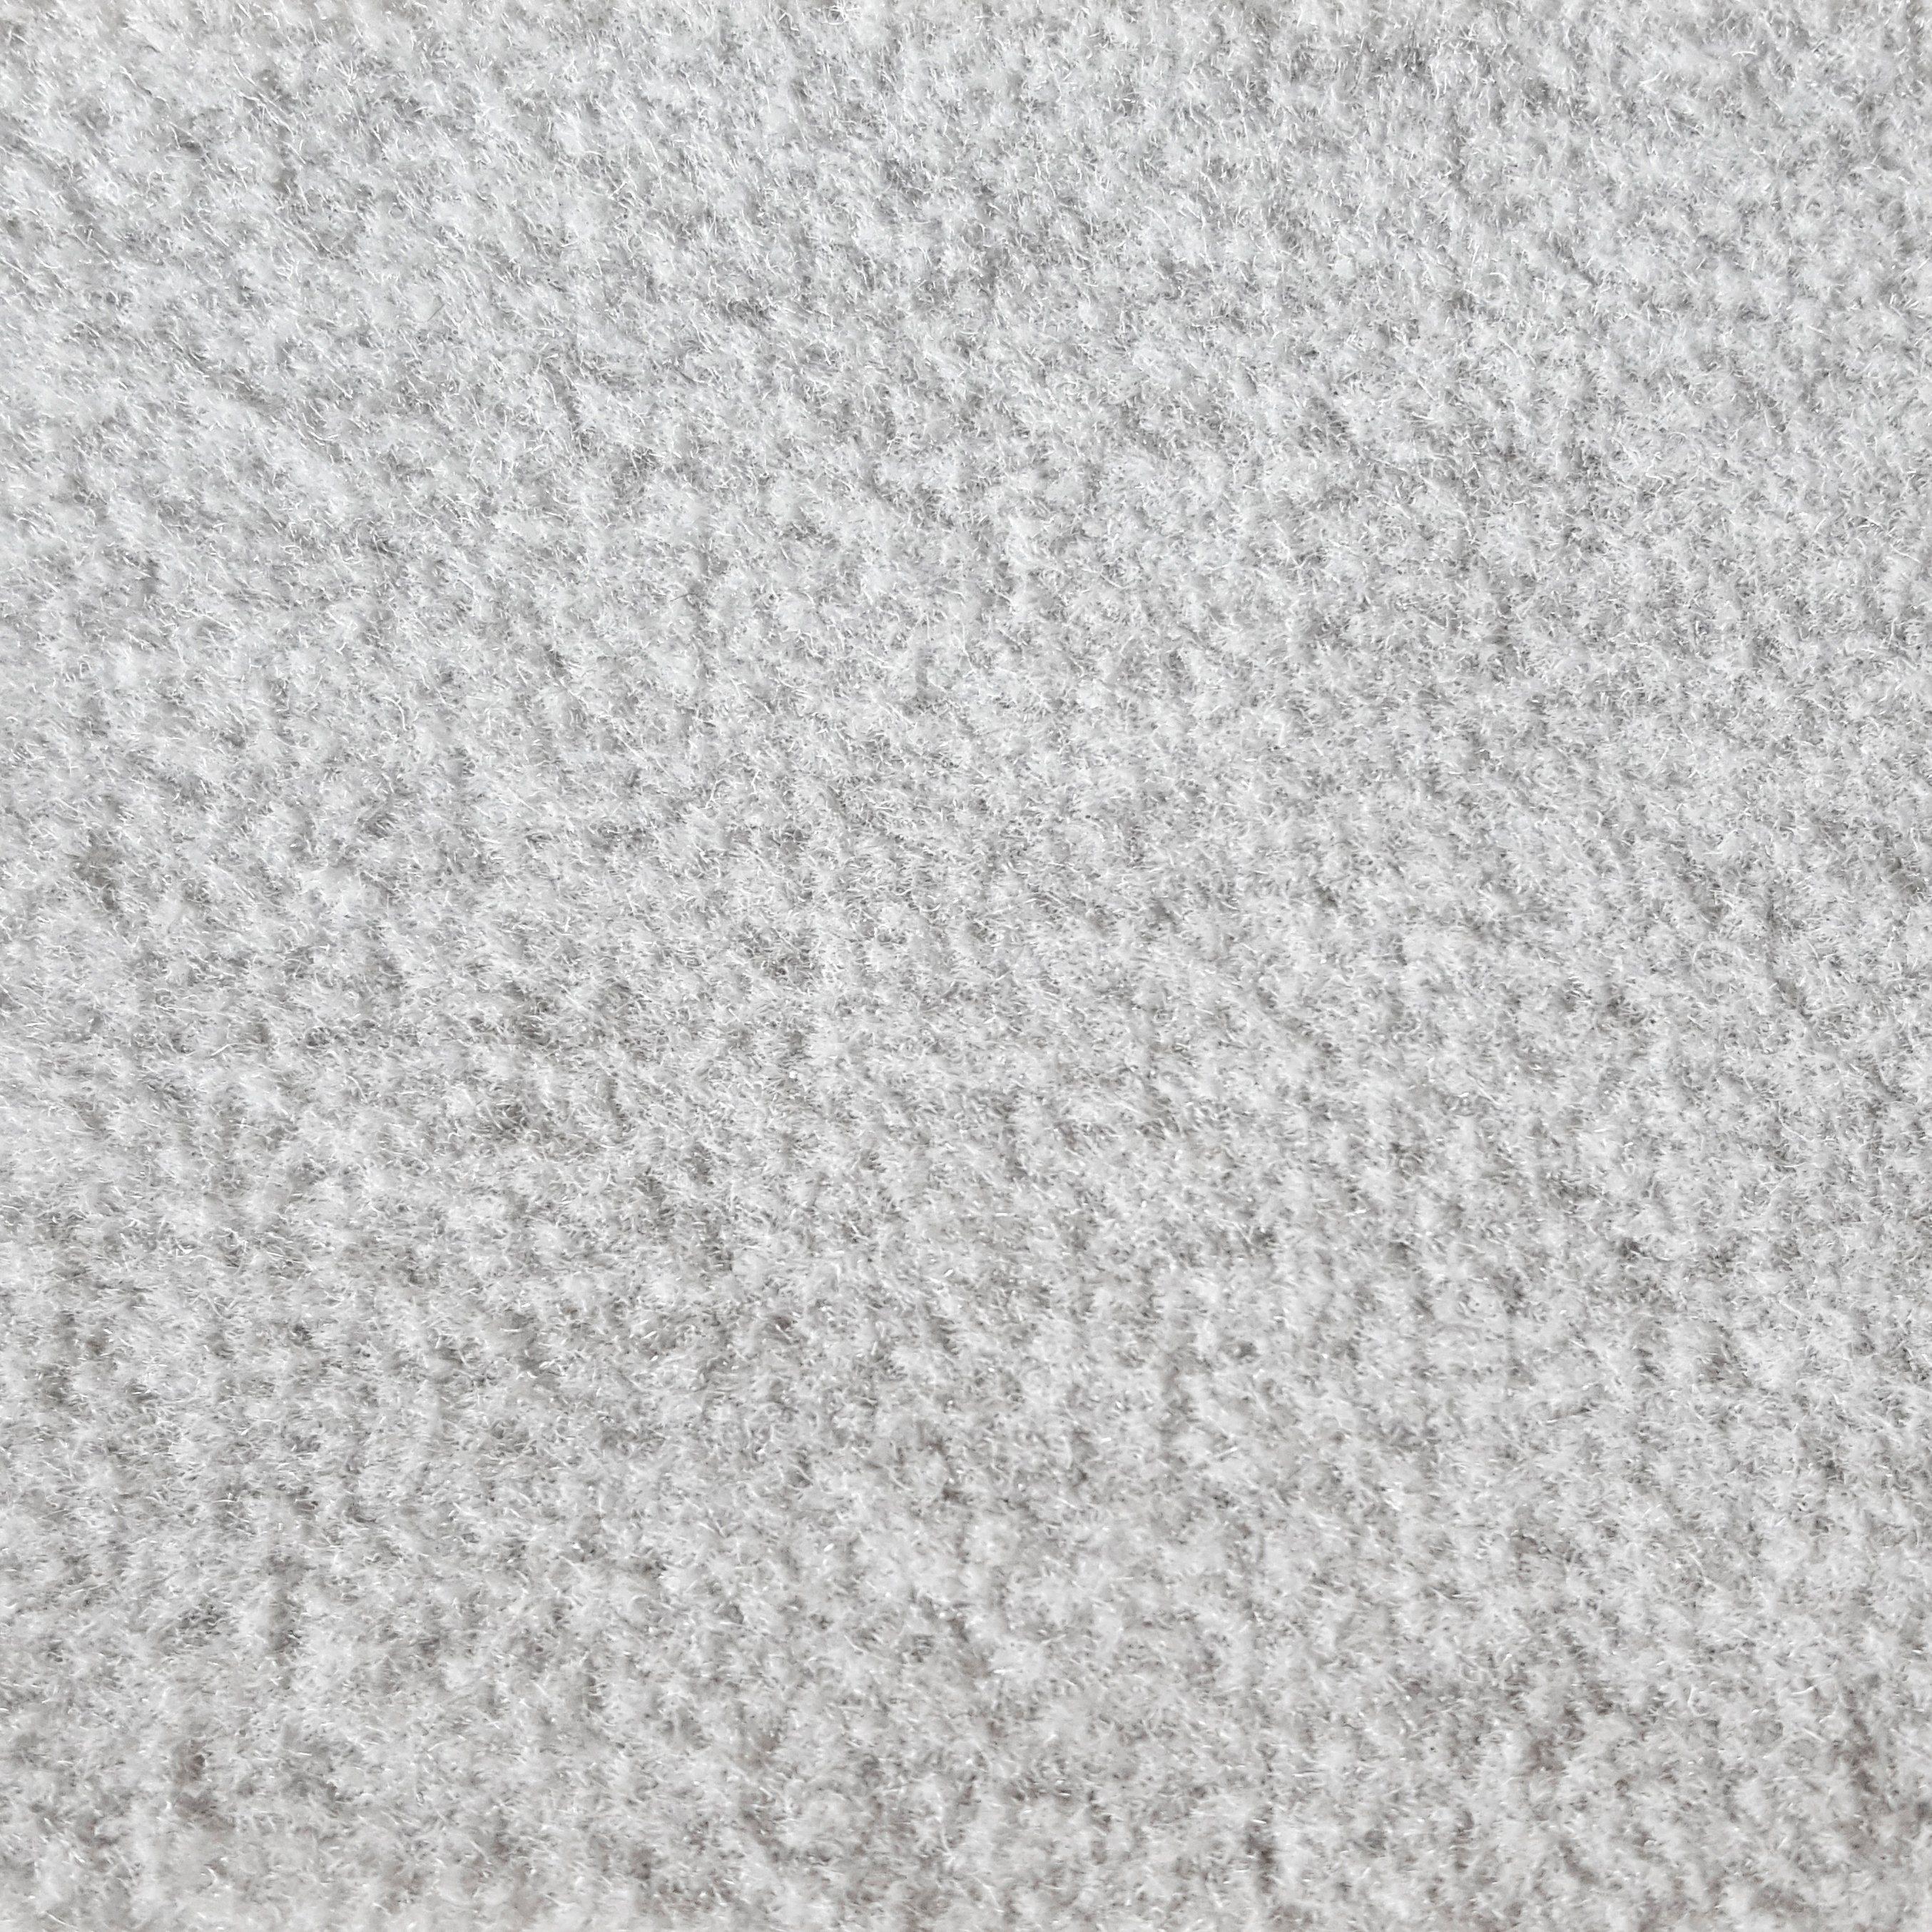 ANDIAMO Teppichboden »Steven hellgrau«, Breite 400 cm